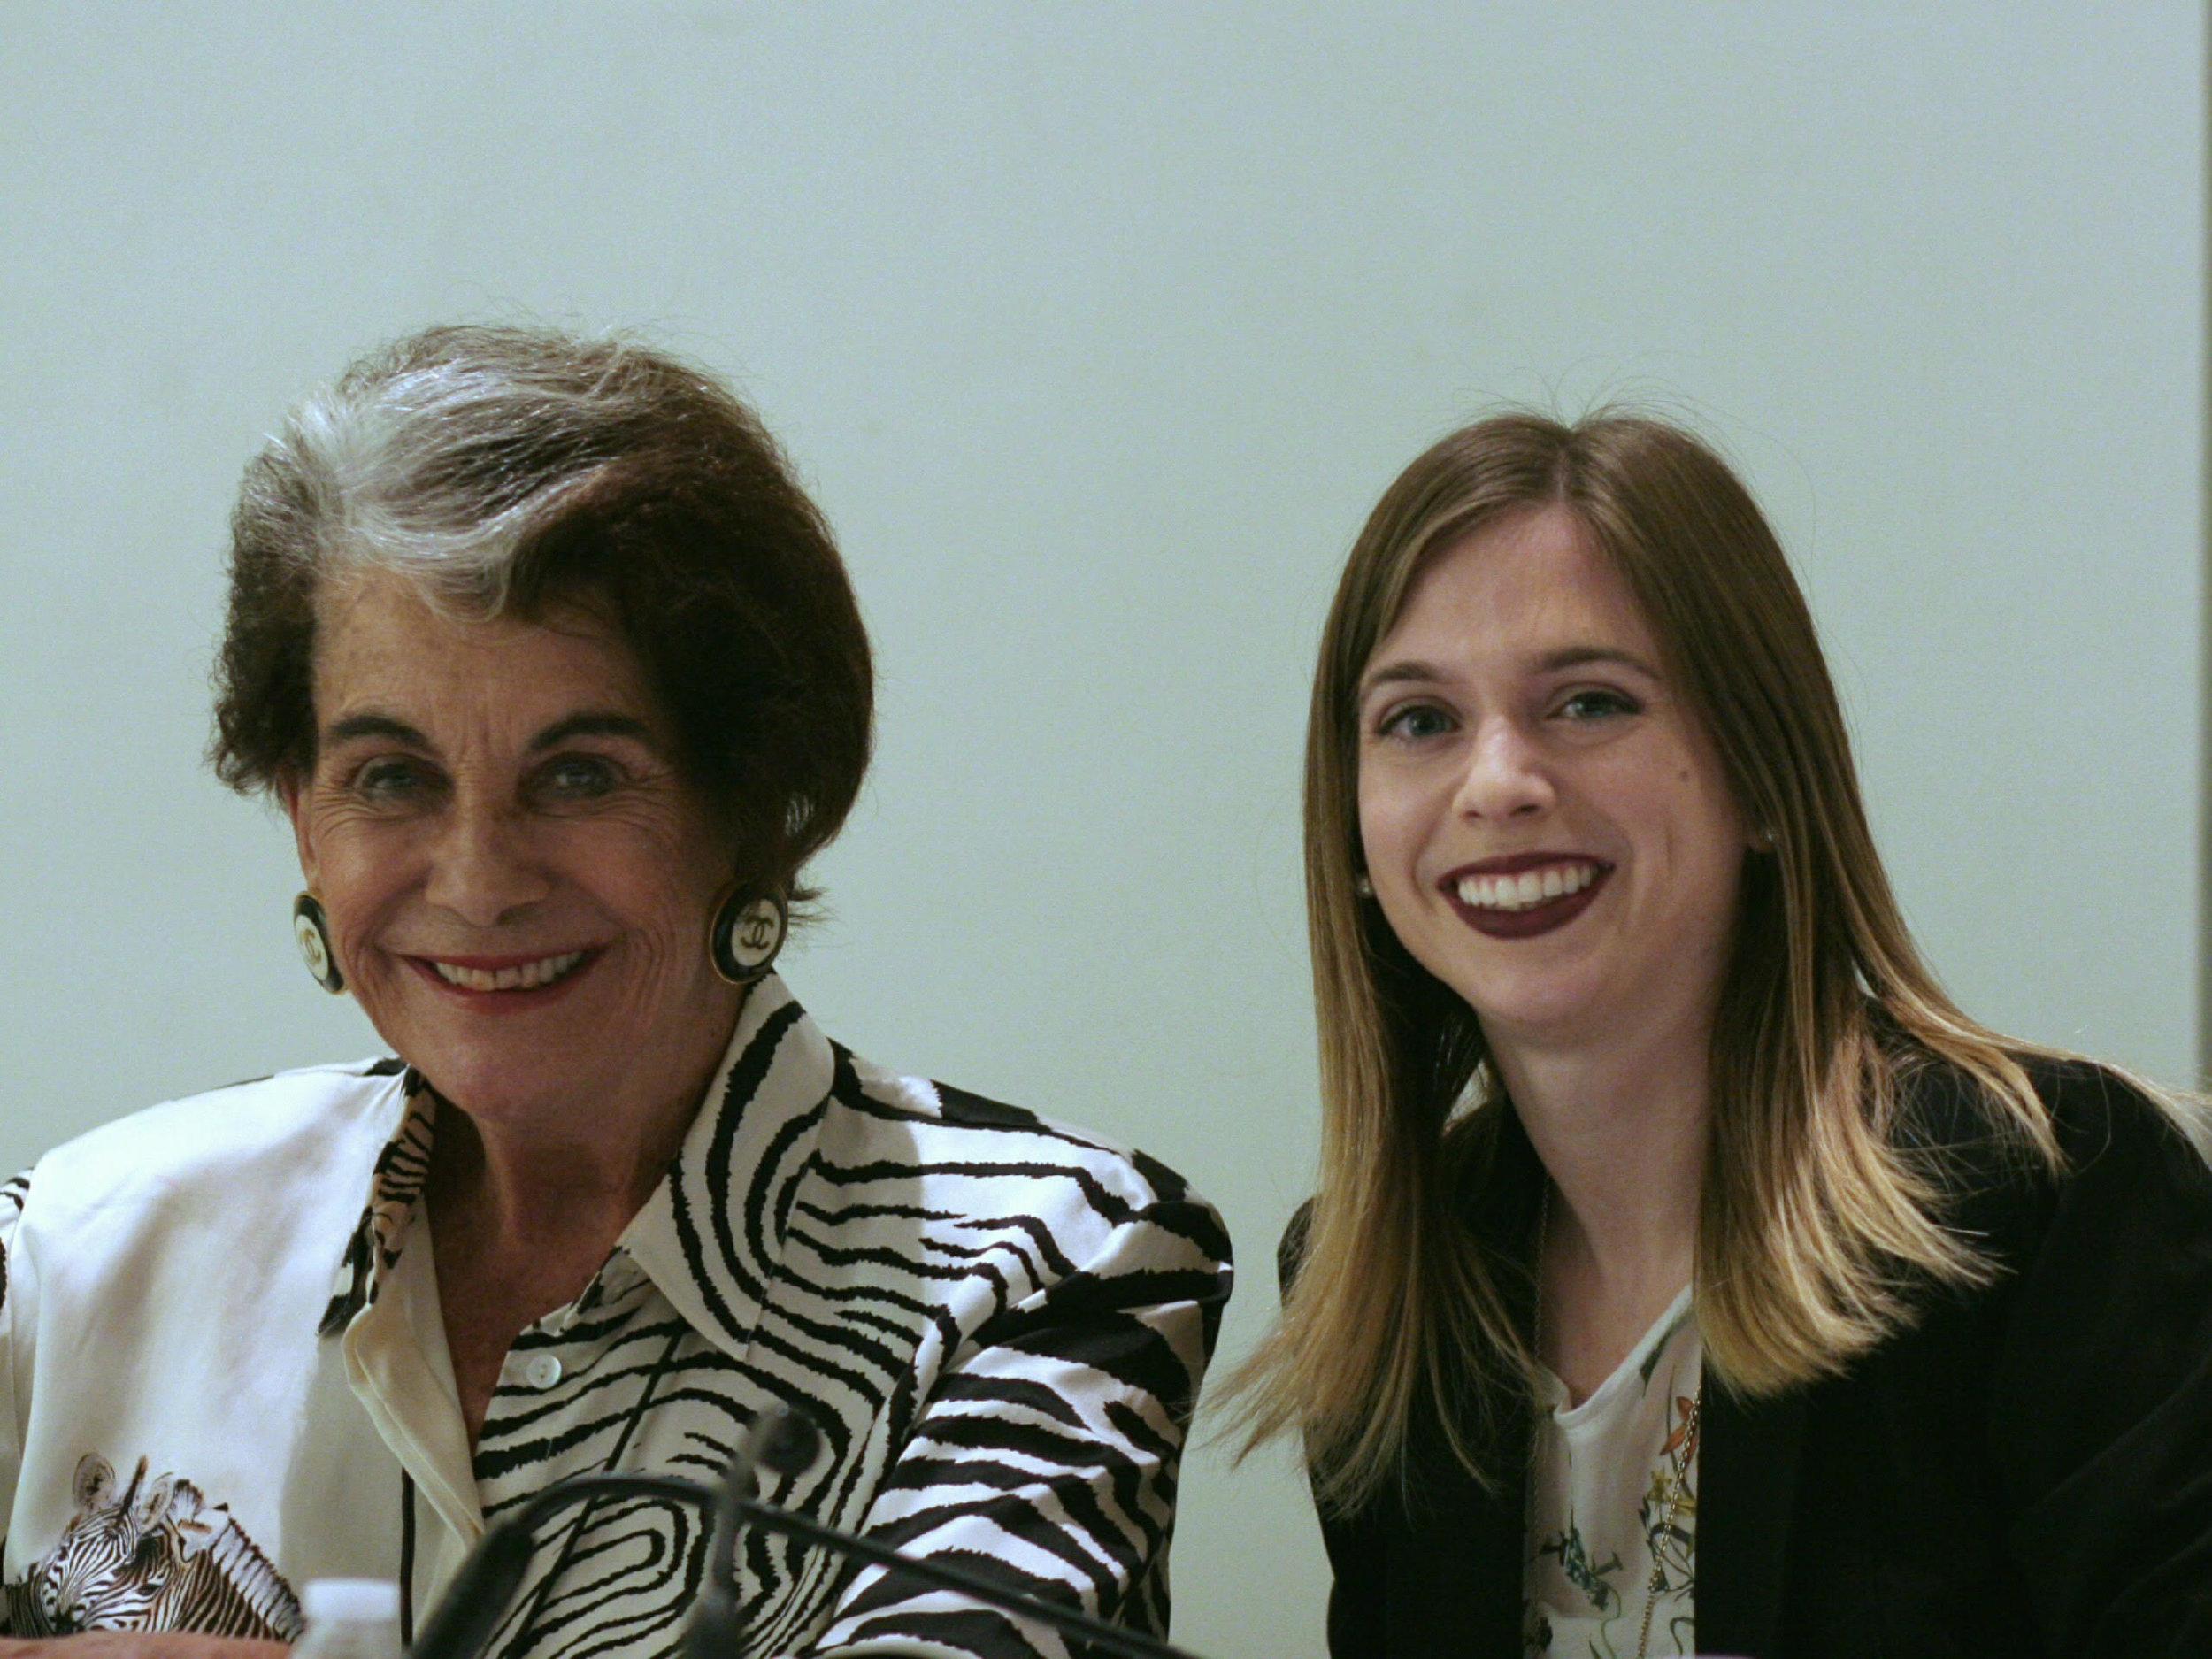 Sitting on the panel with Sara Jane Karloff, daughter of actor Boris Karloff.